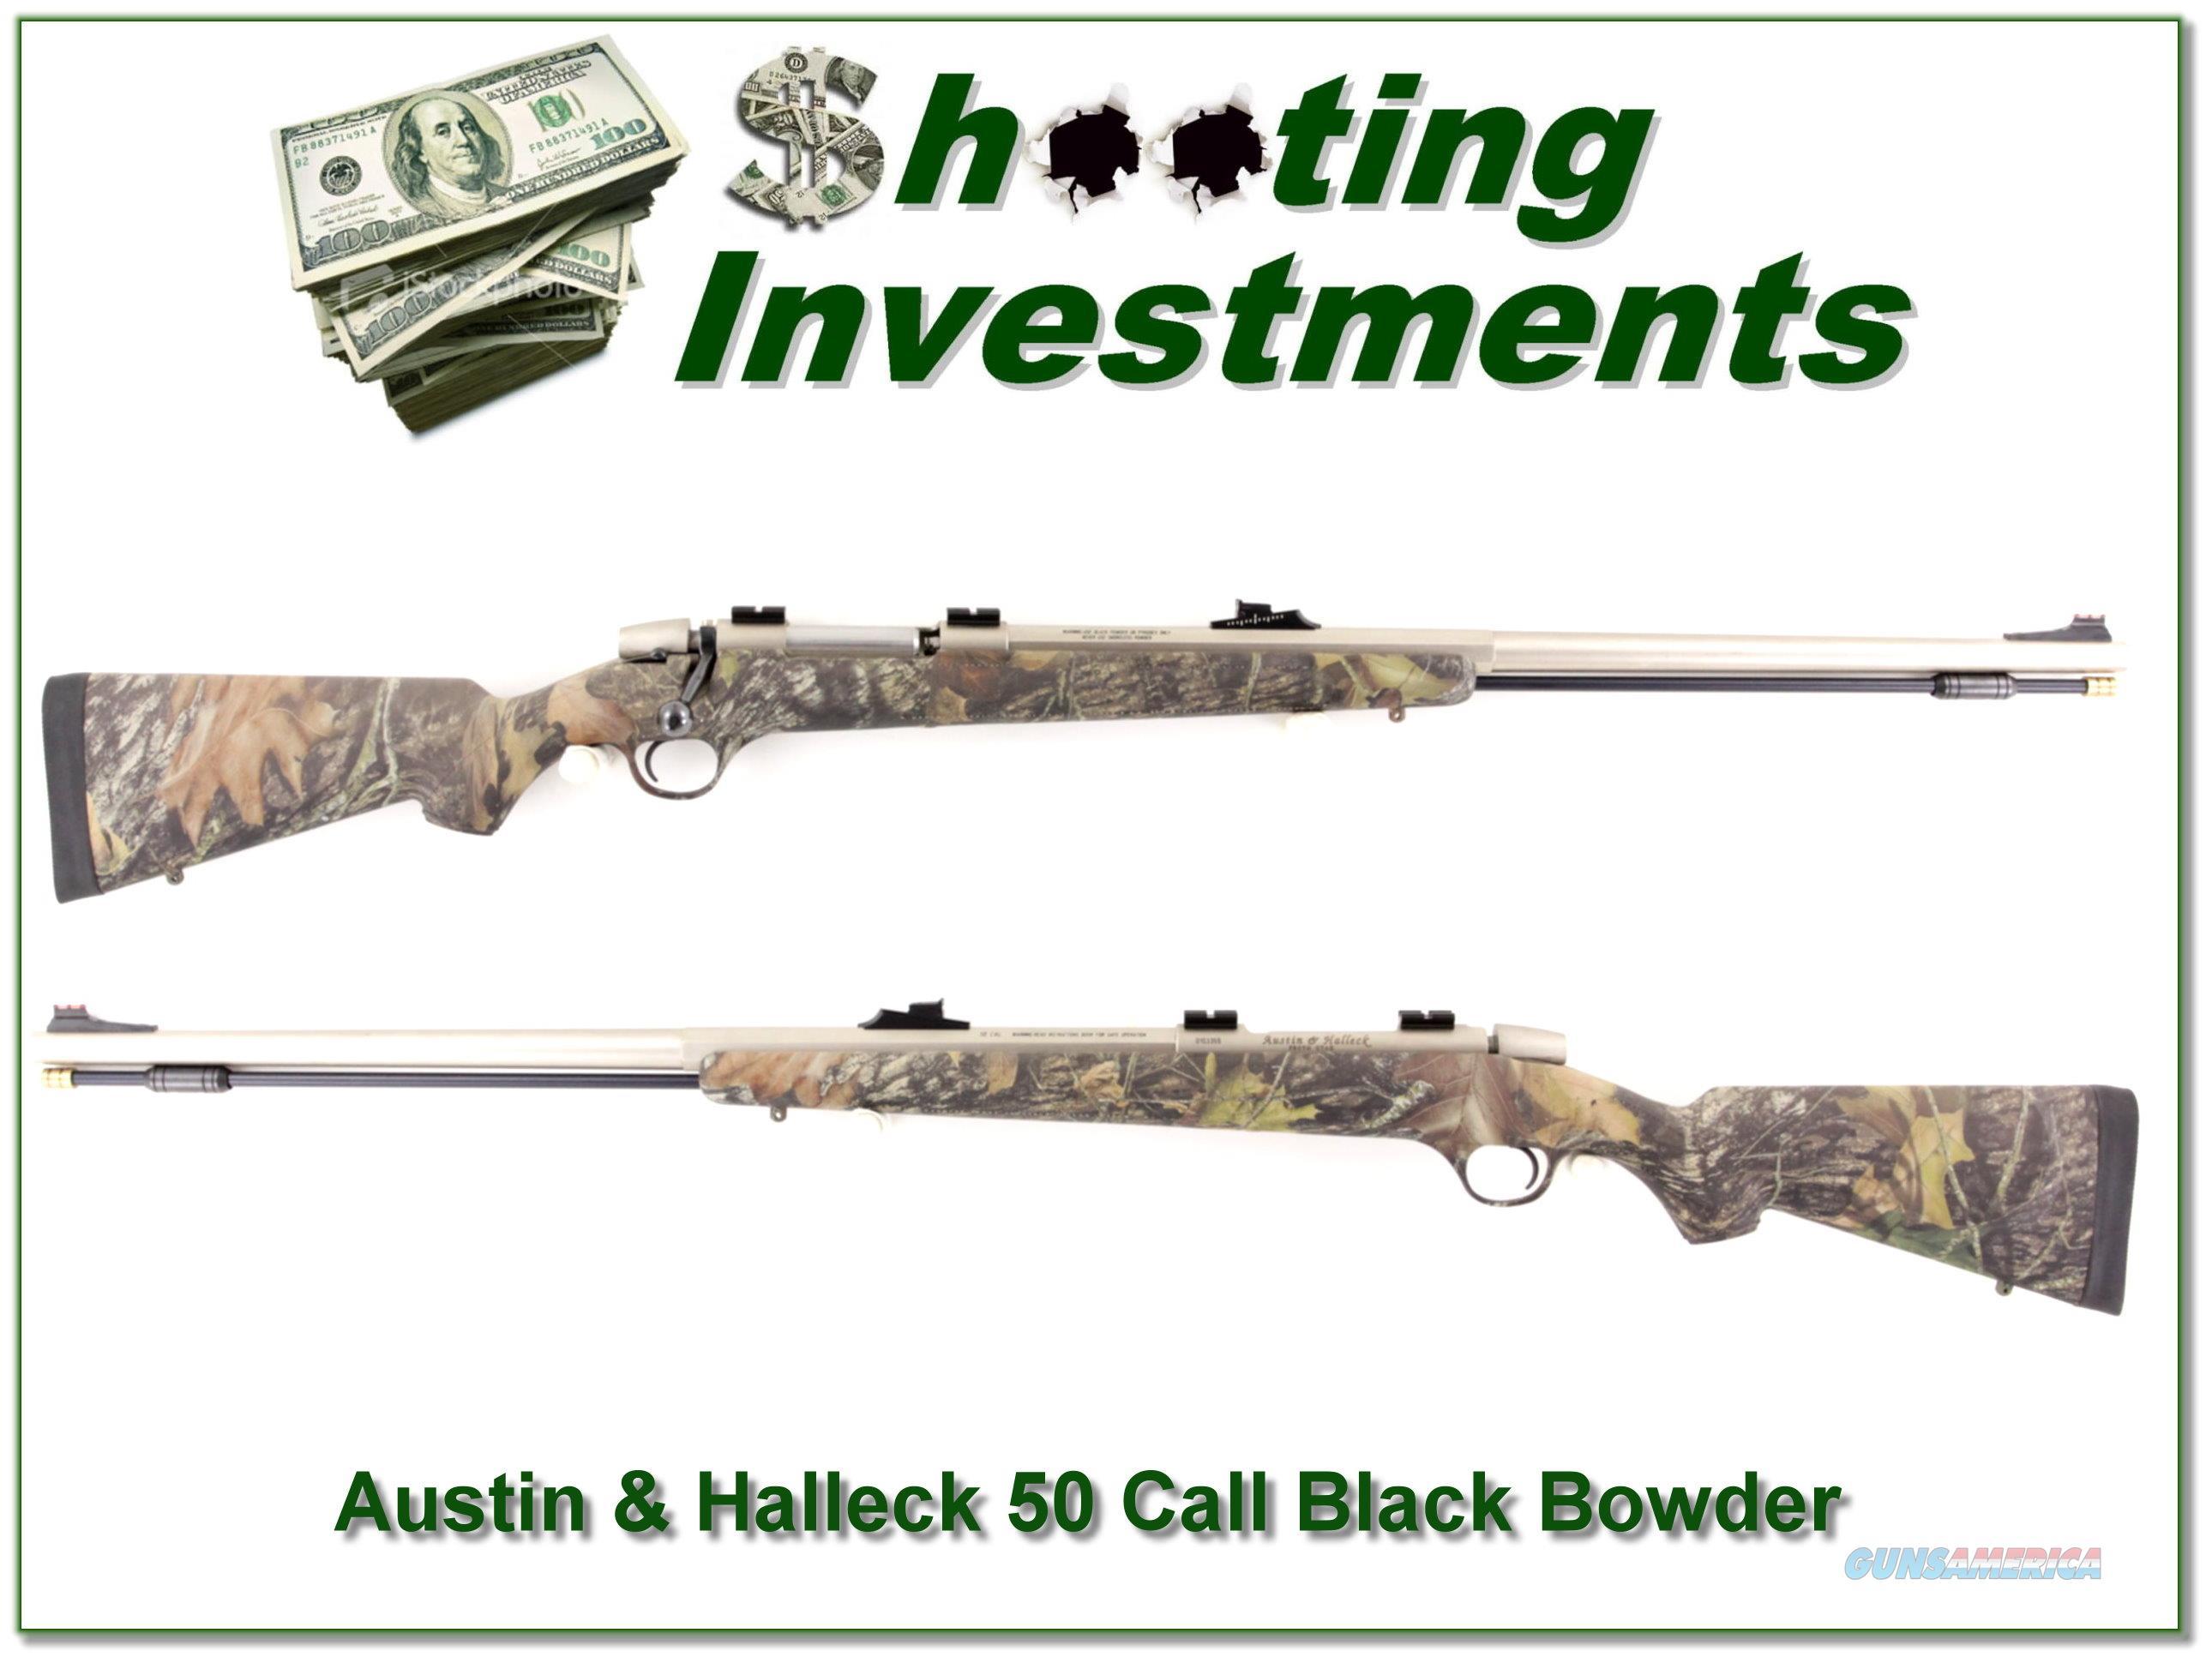 Austin & Halleck Stainless Black Powder 50 Cal  Guns > Rifles > Muzzleloading Modern & Replica Rifles (perc) > Modern Inline